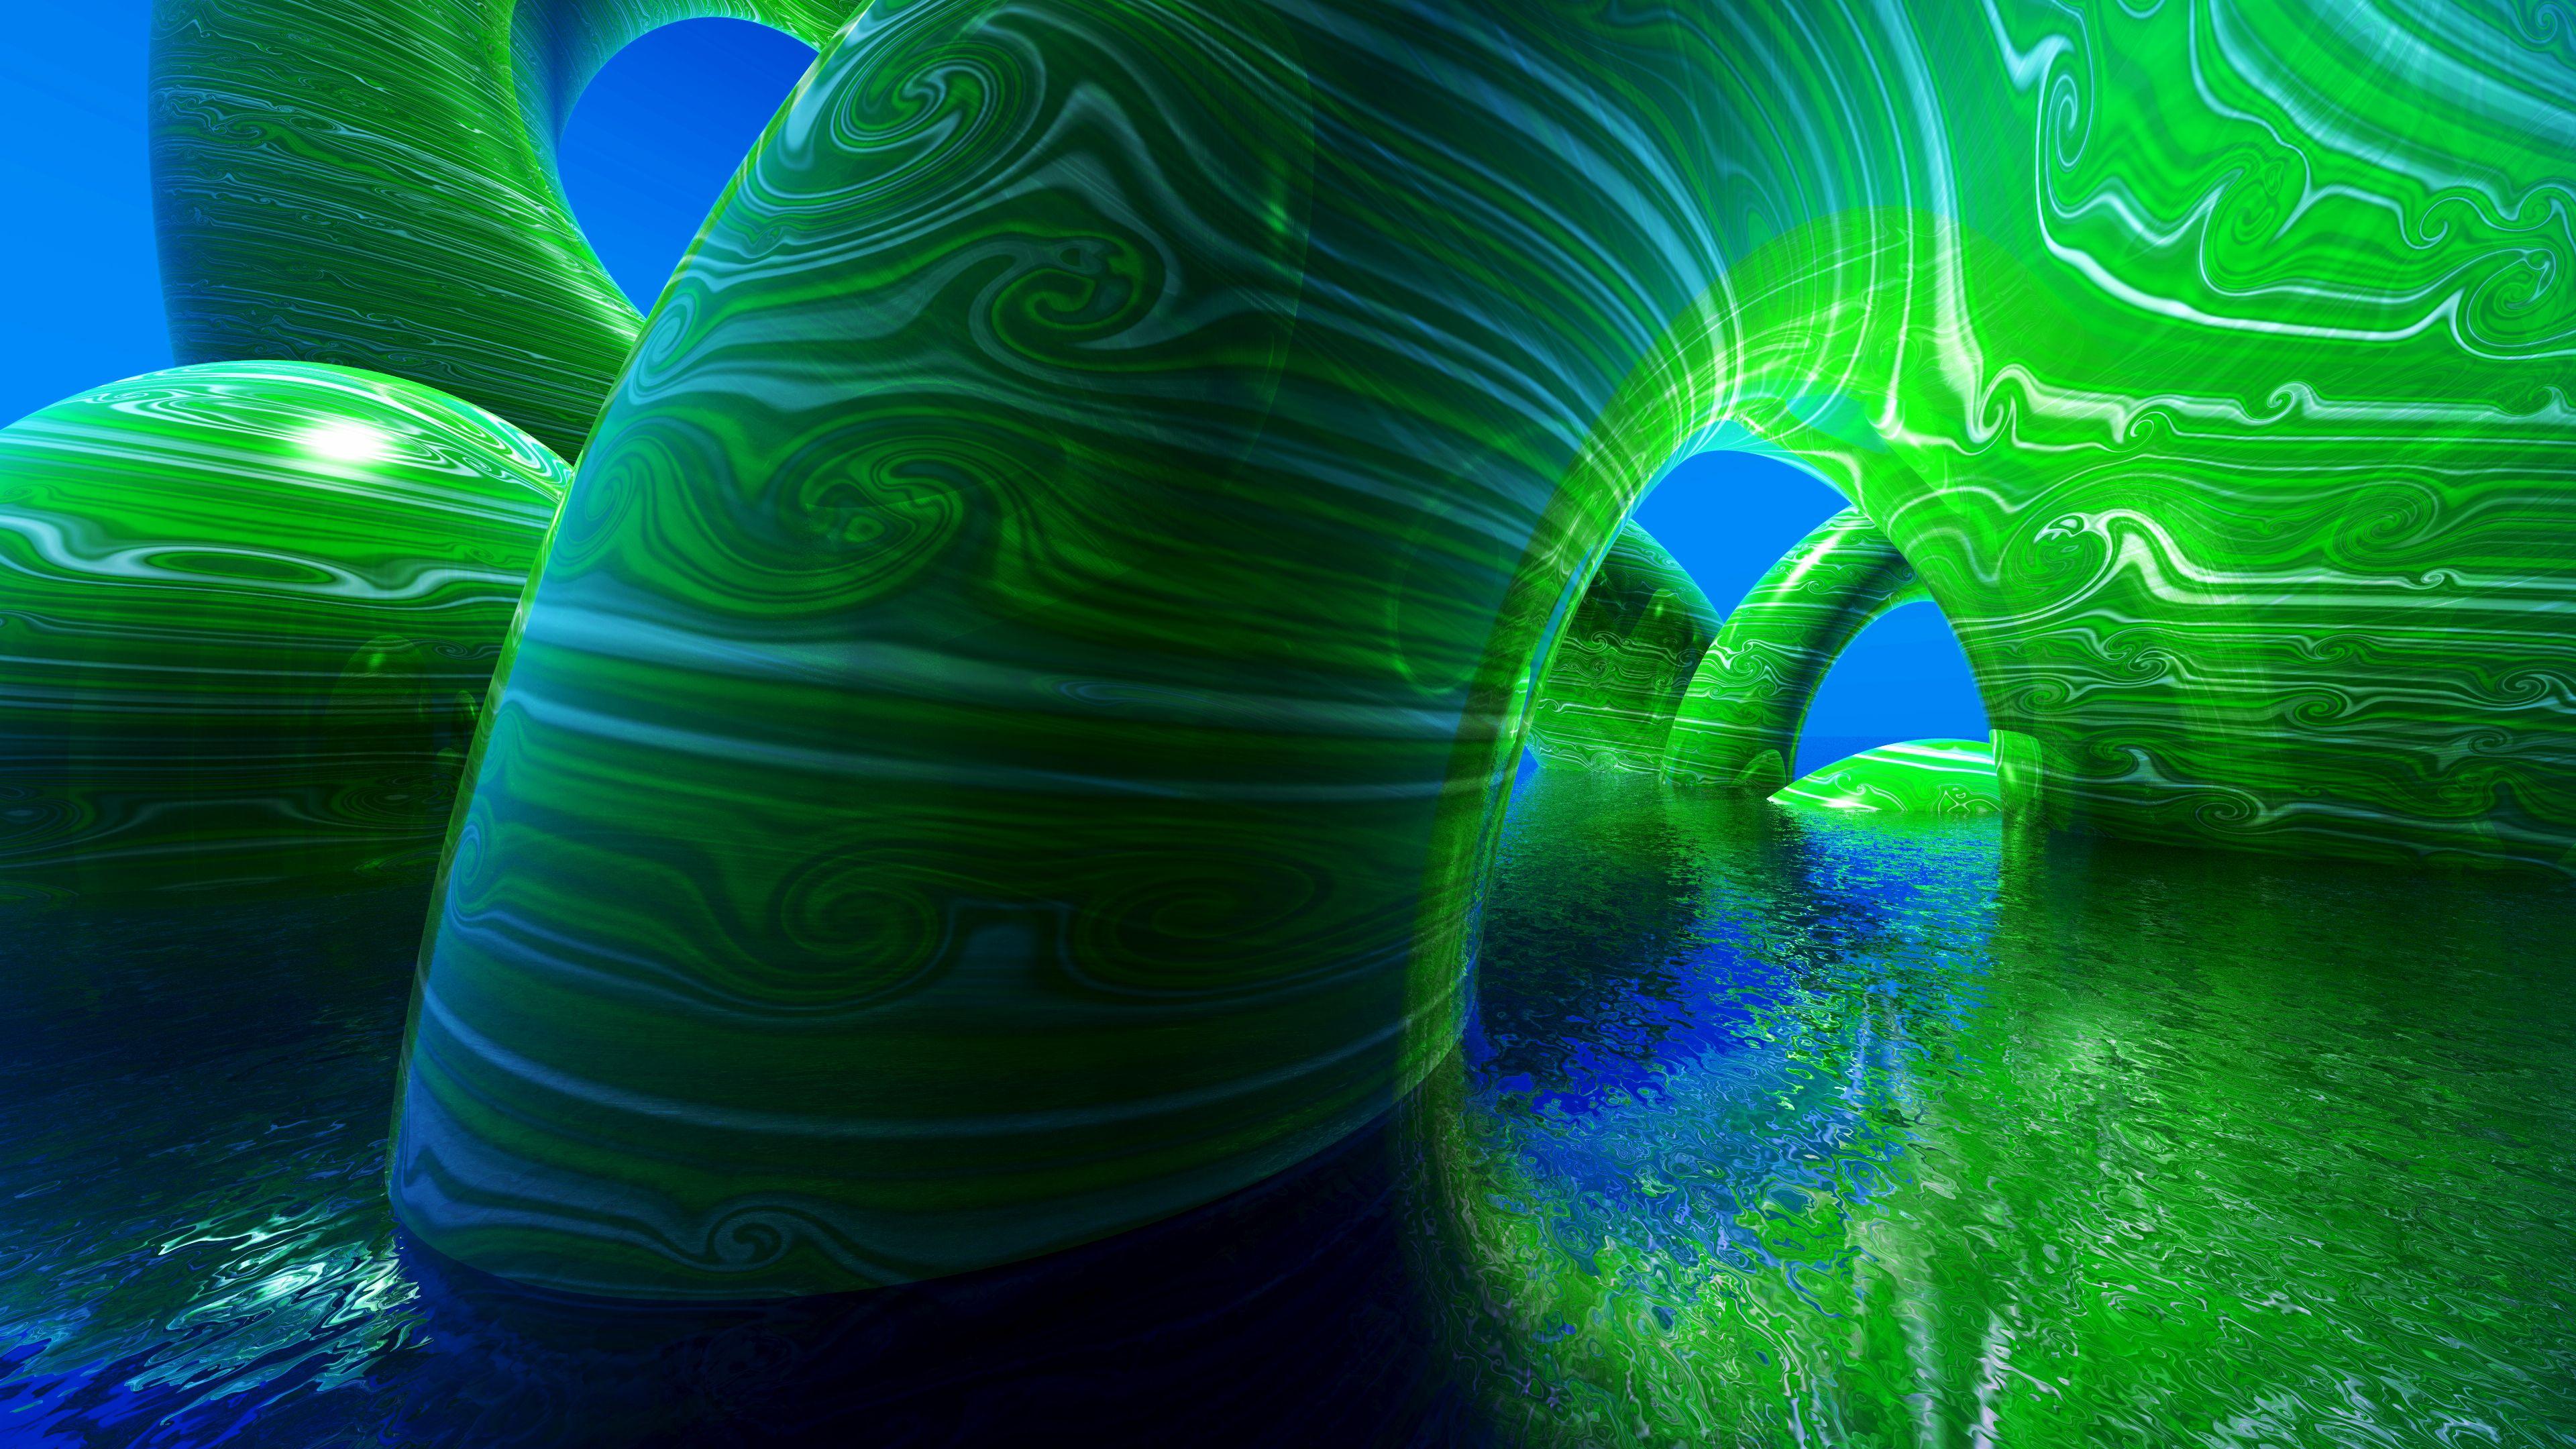 Blue Abstract 4k Wallpaper Full 1080p Ultra Hd Wallpapers Anime Wallpaper Oneplus Wallpapers Abstract Nature